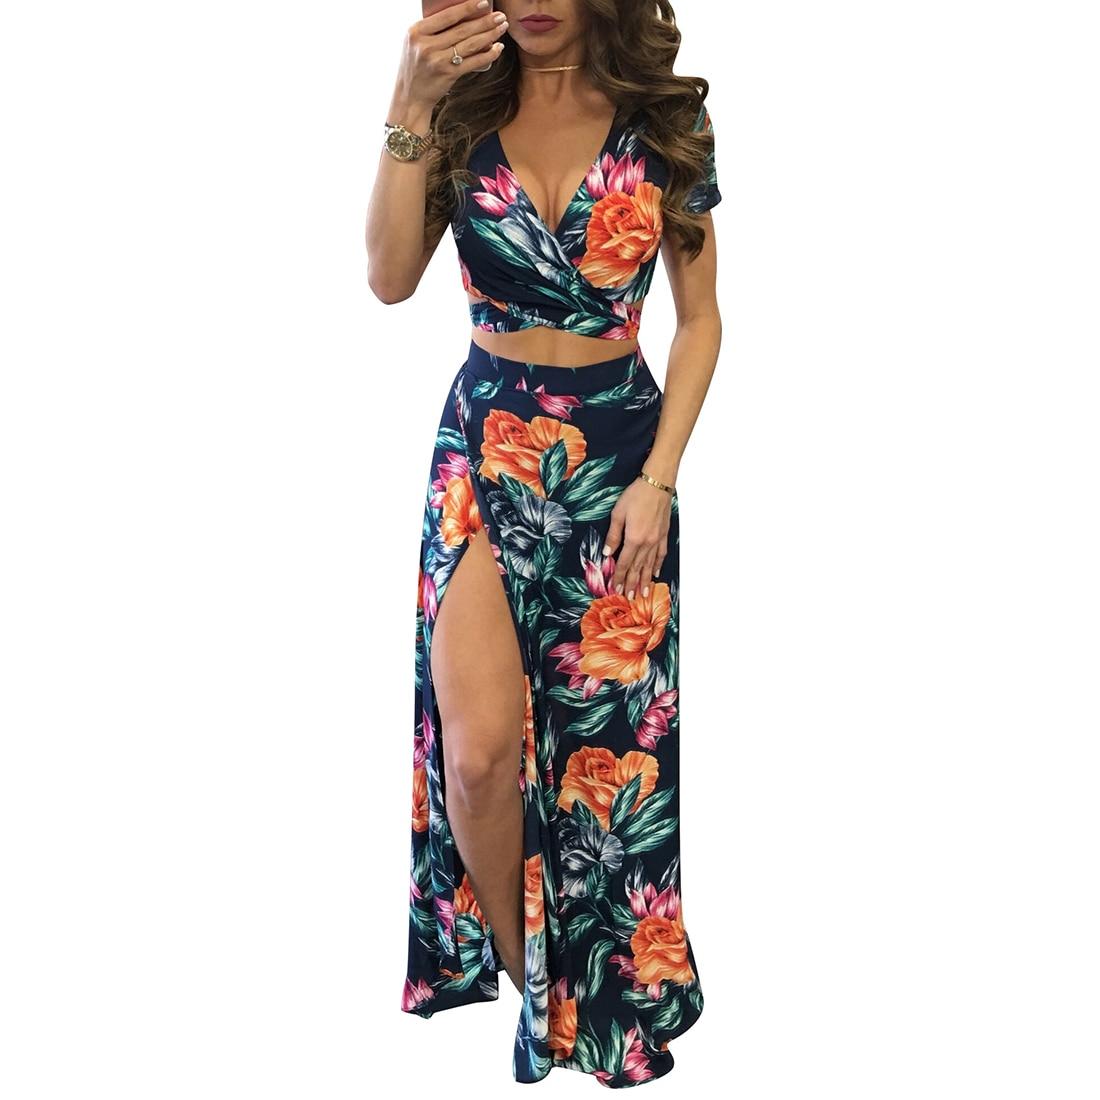 efe2093f137e YJSFG HOUSE Elegant Women Summer Long Maxi Dresses Two Piece Set Sexy 2019  Hollow Out Crop